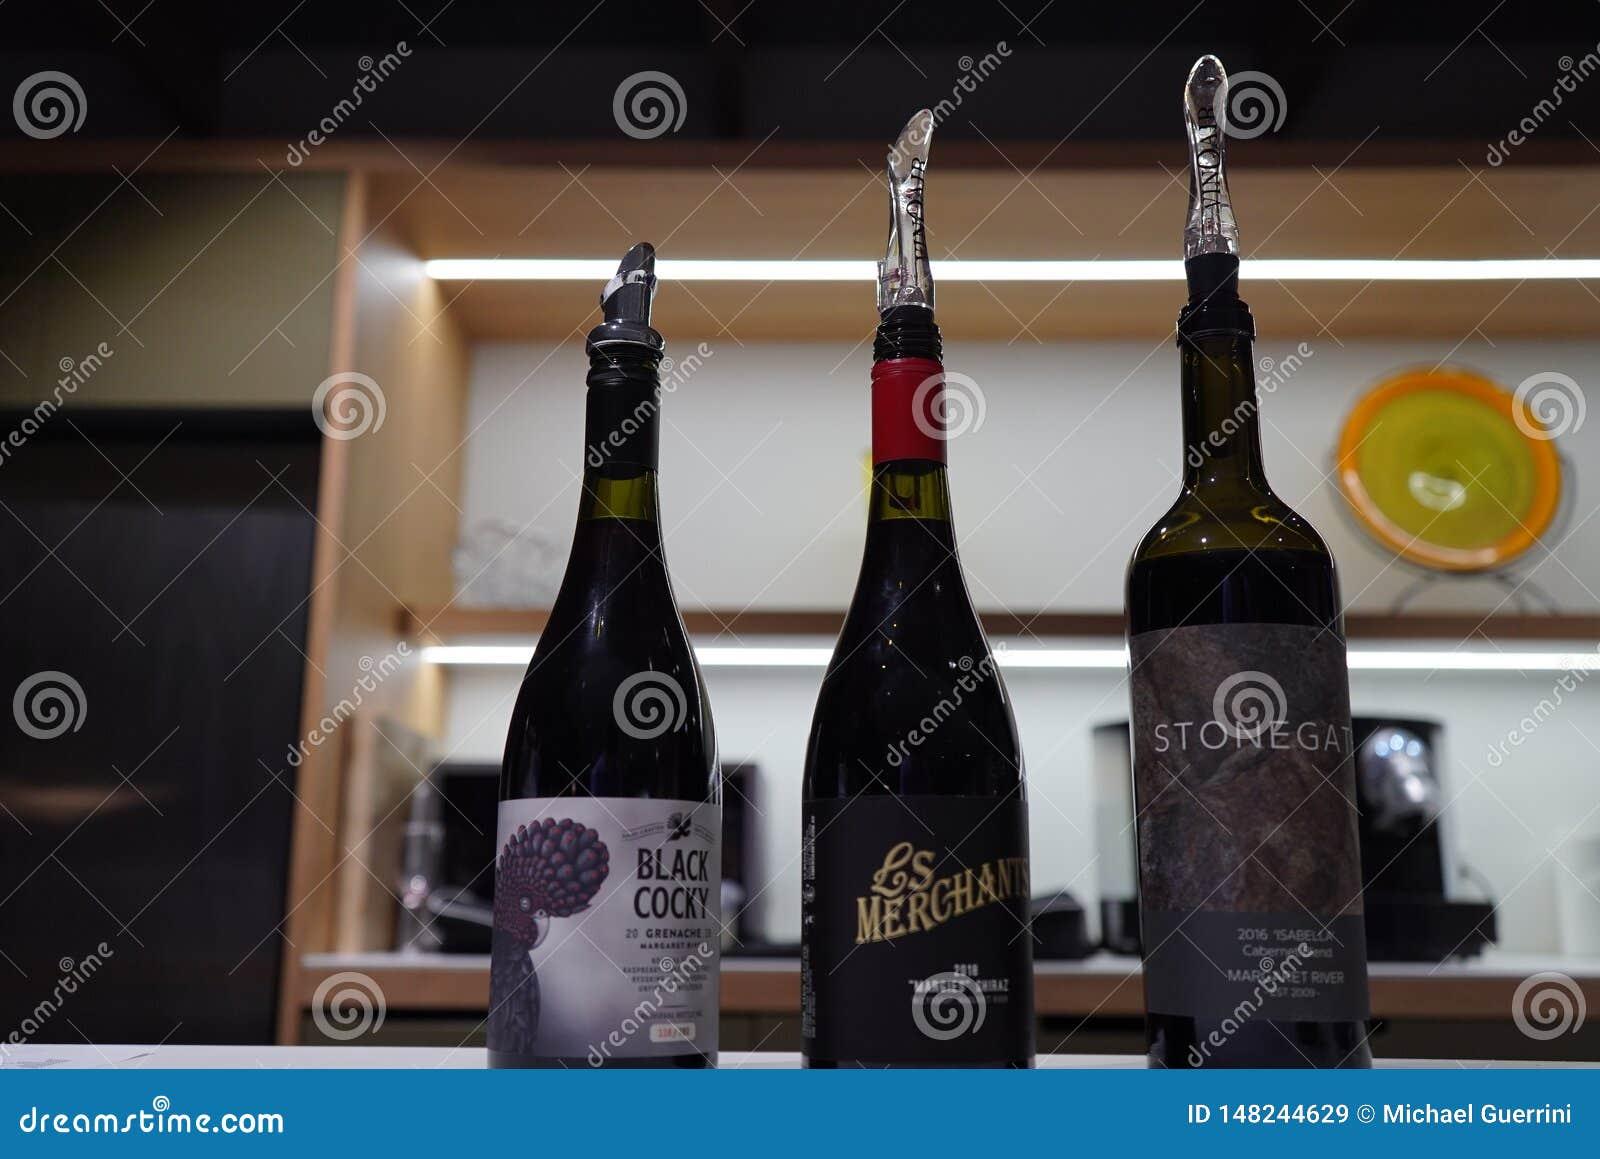 Une rang?e des verres de vin